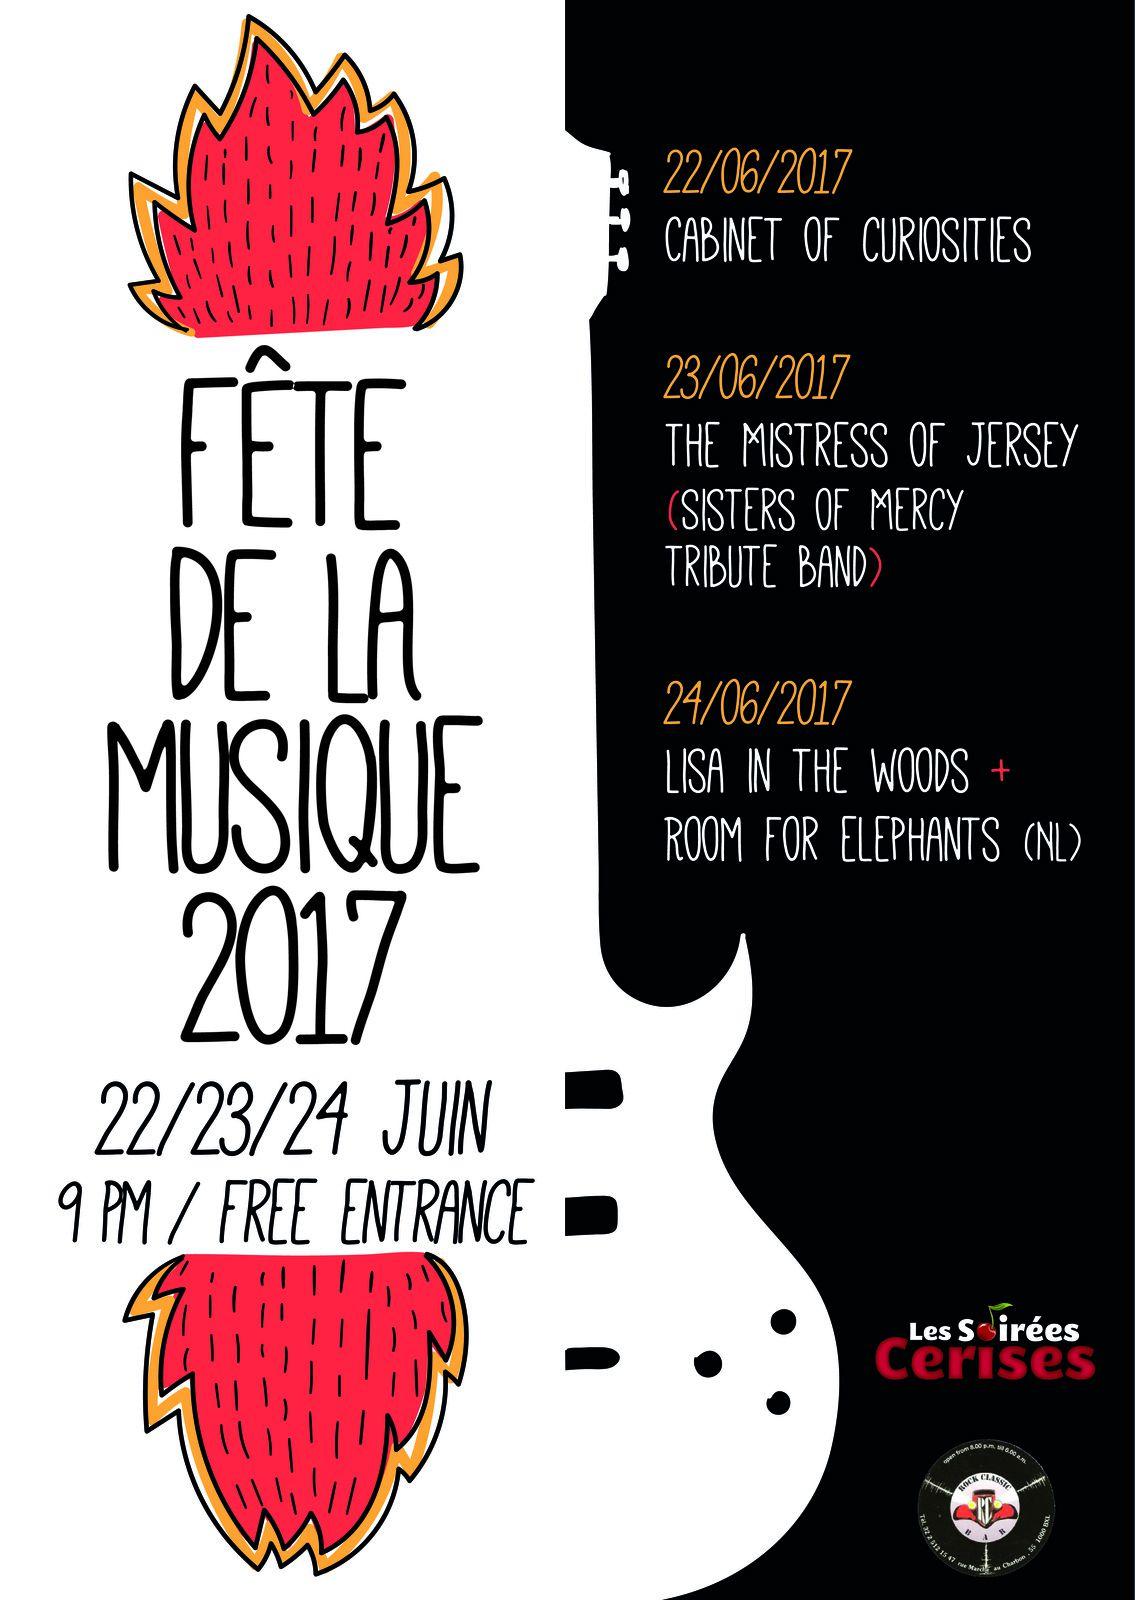 ▶ Cabinet of Curiosities @ Rock Classic - 22/06/2017 - 20h30 - Entrée gratuite !